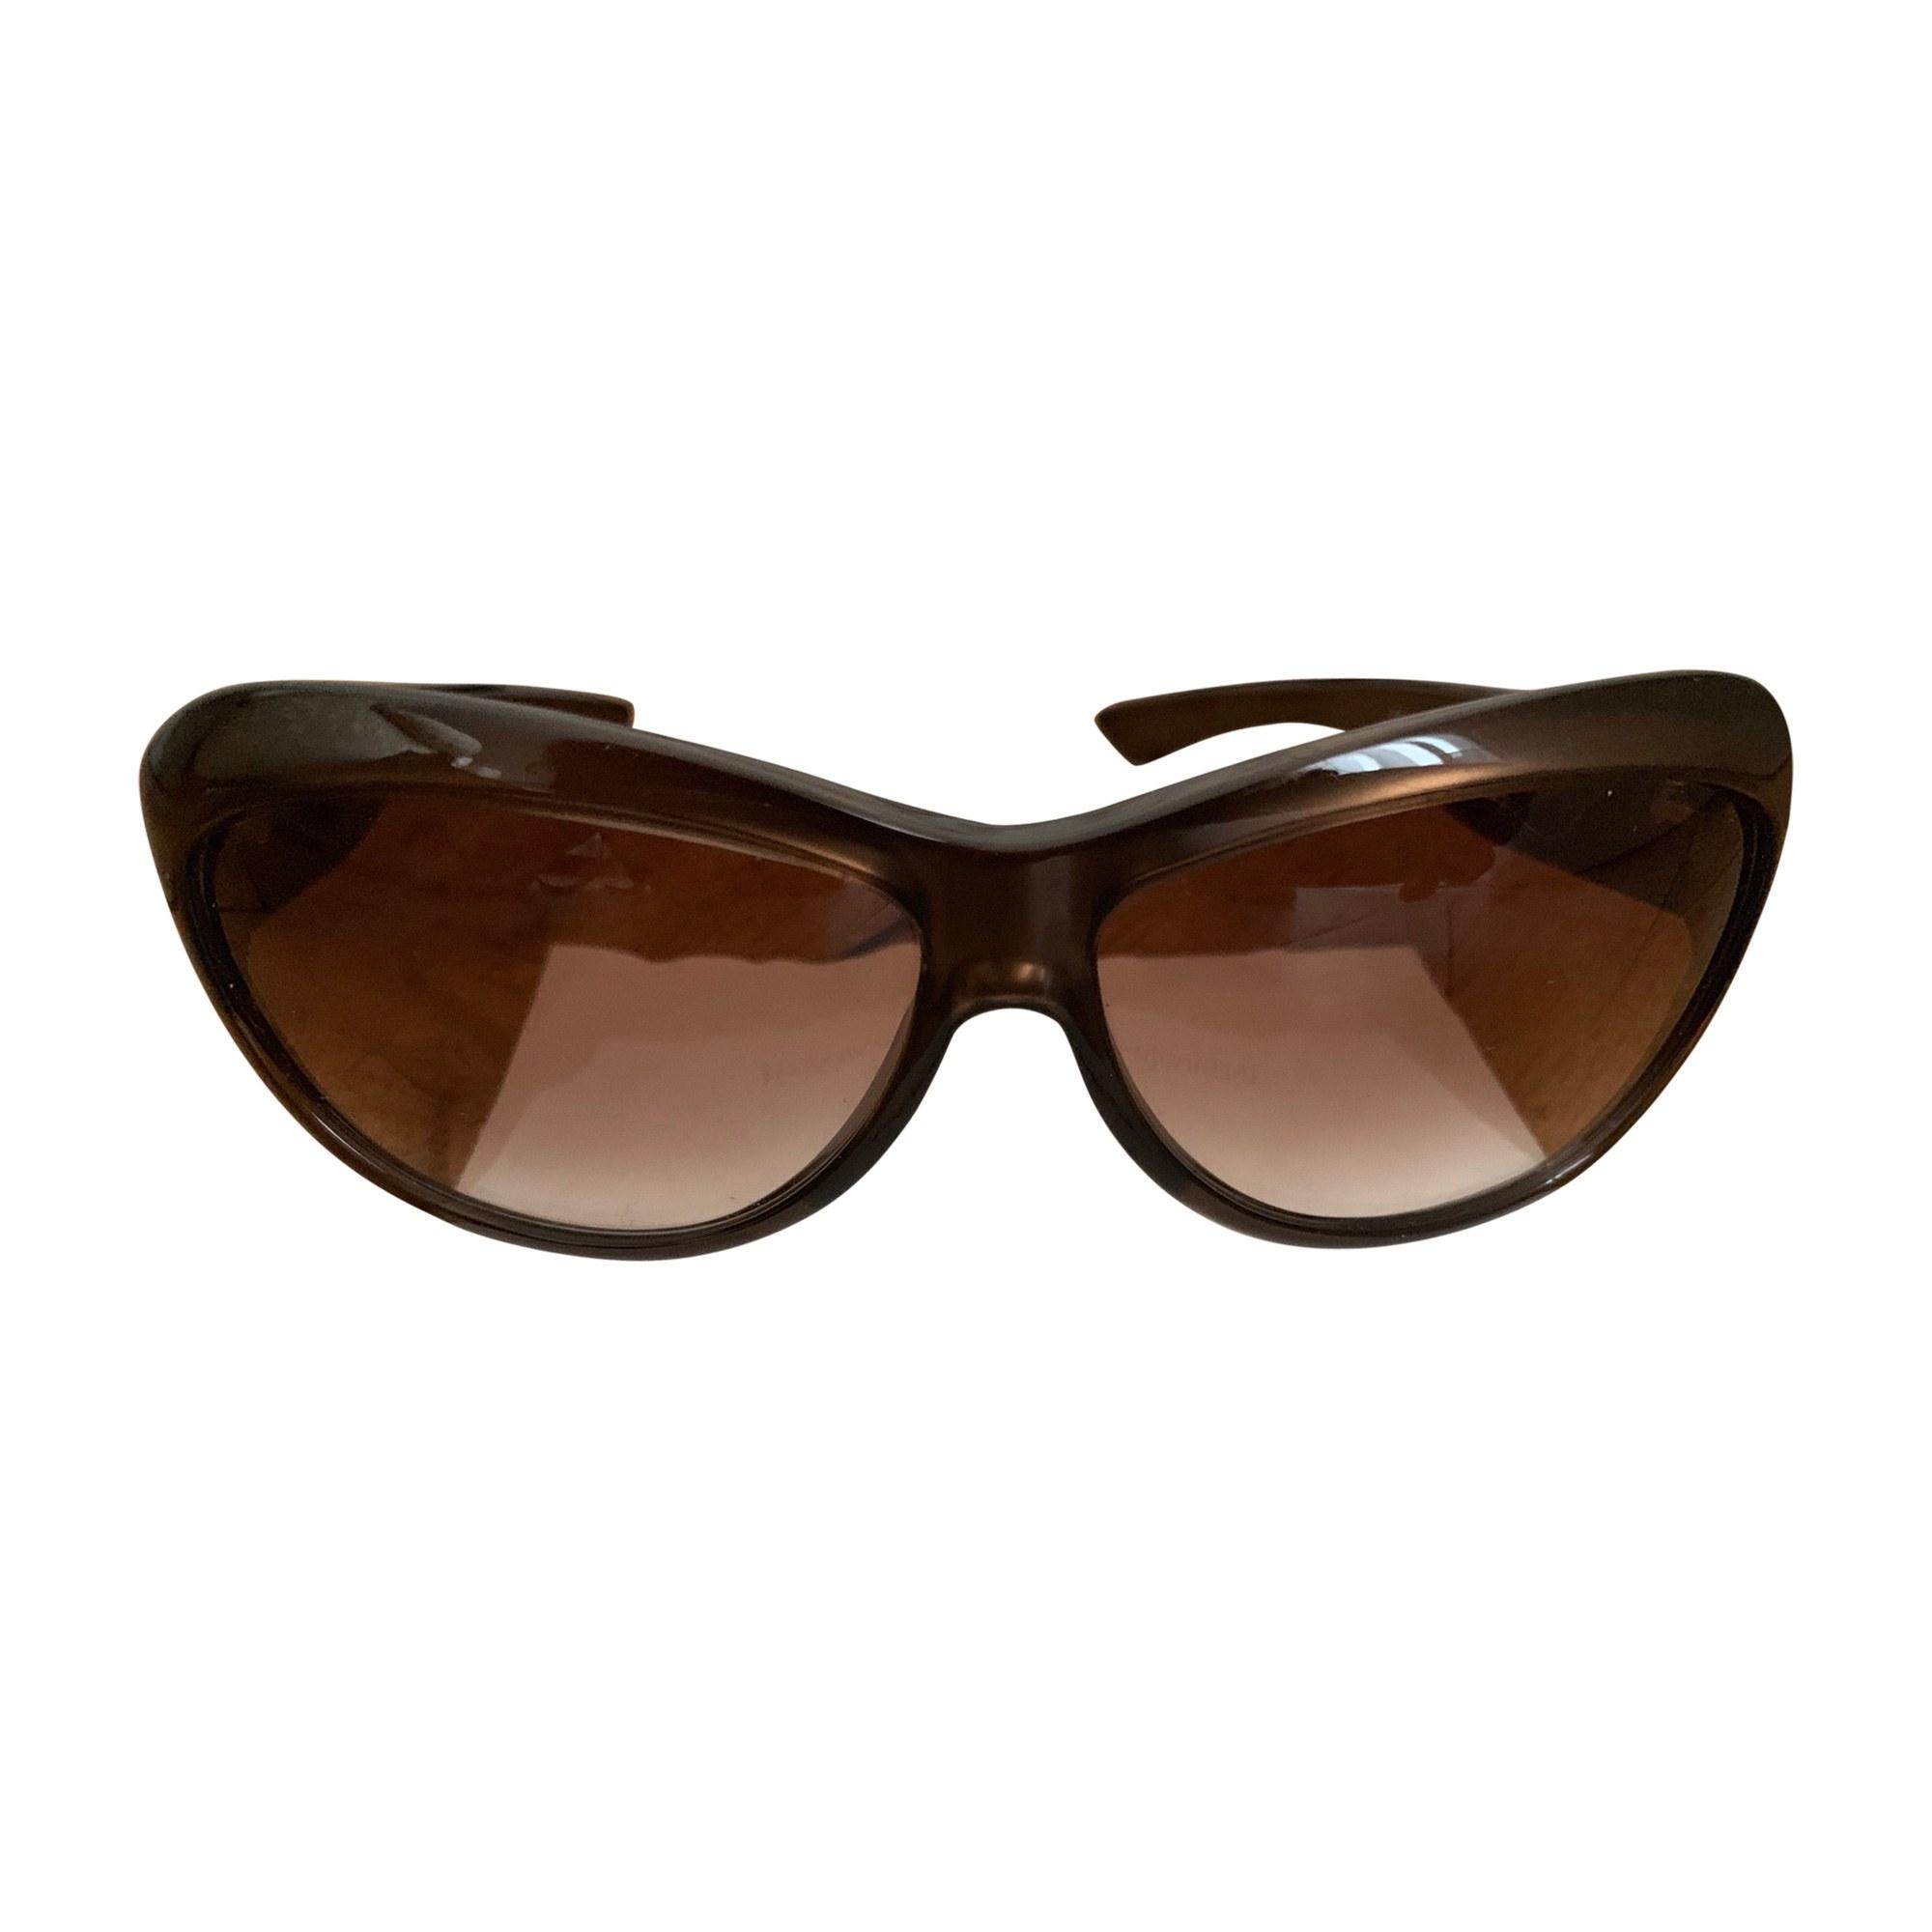 Sonnenbrille YVES SAINT LAURENT Braun